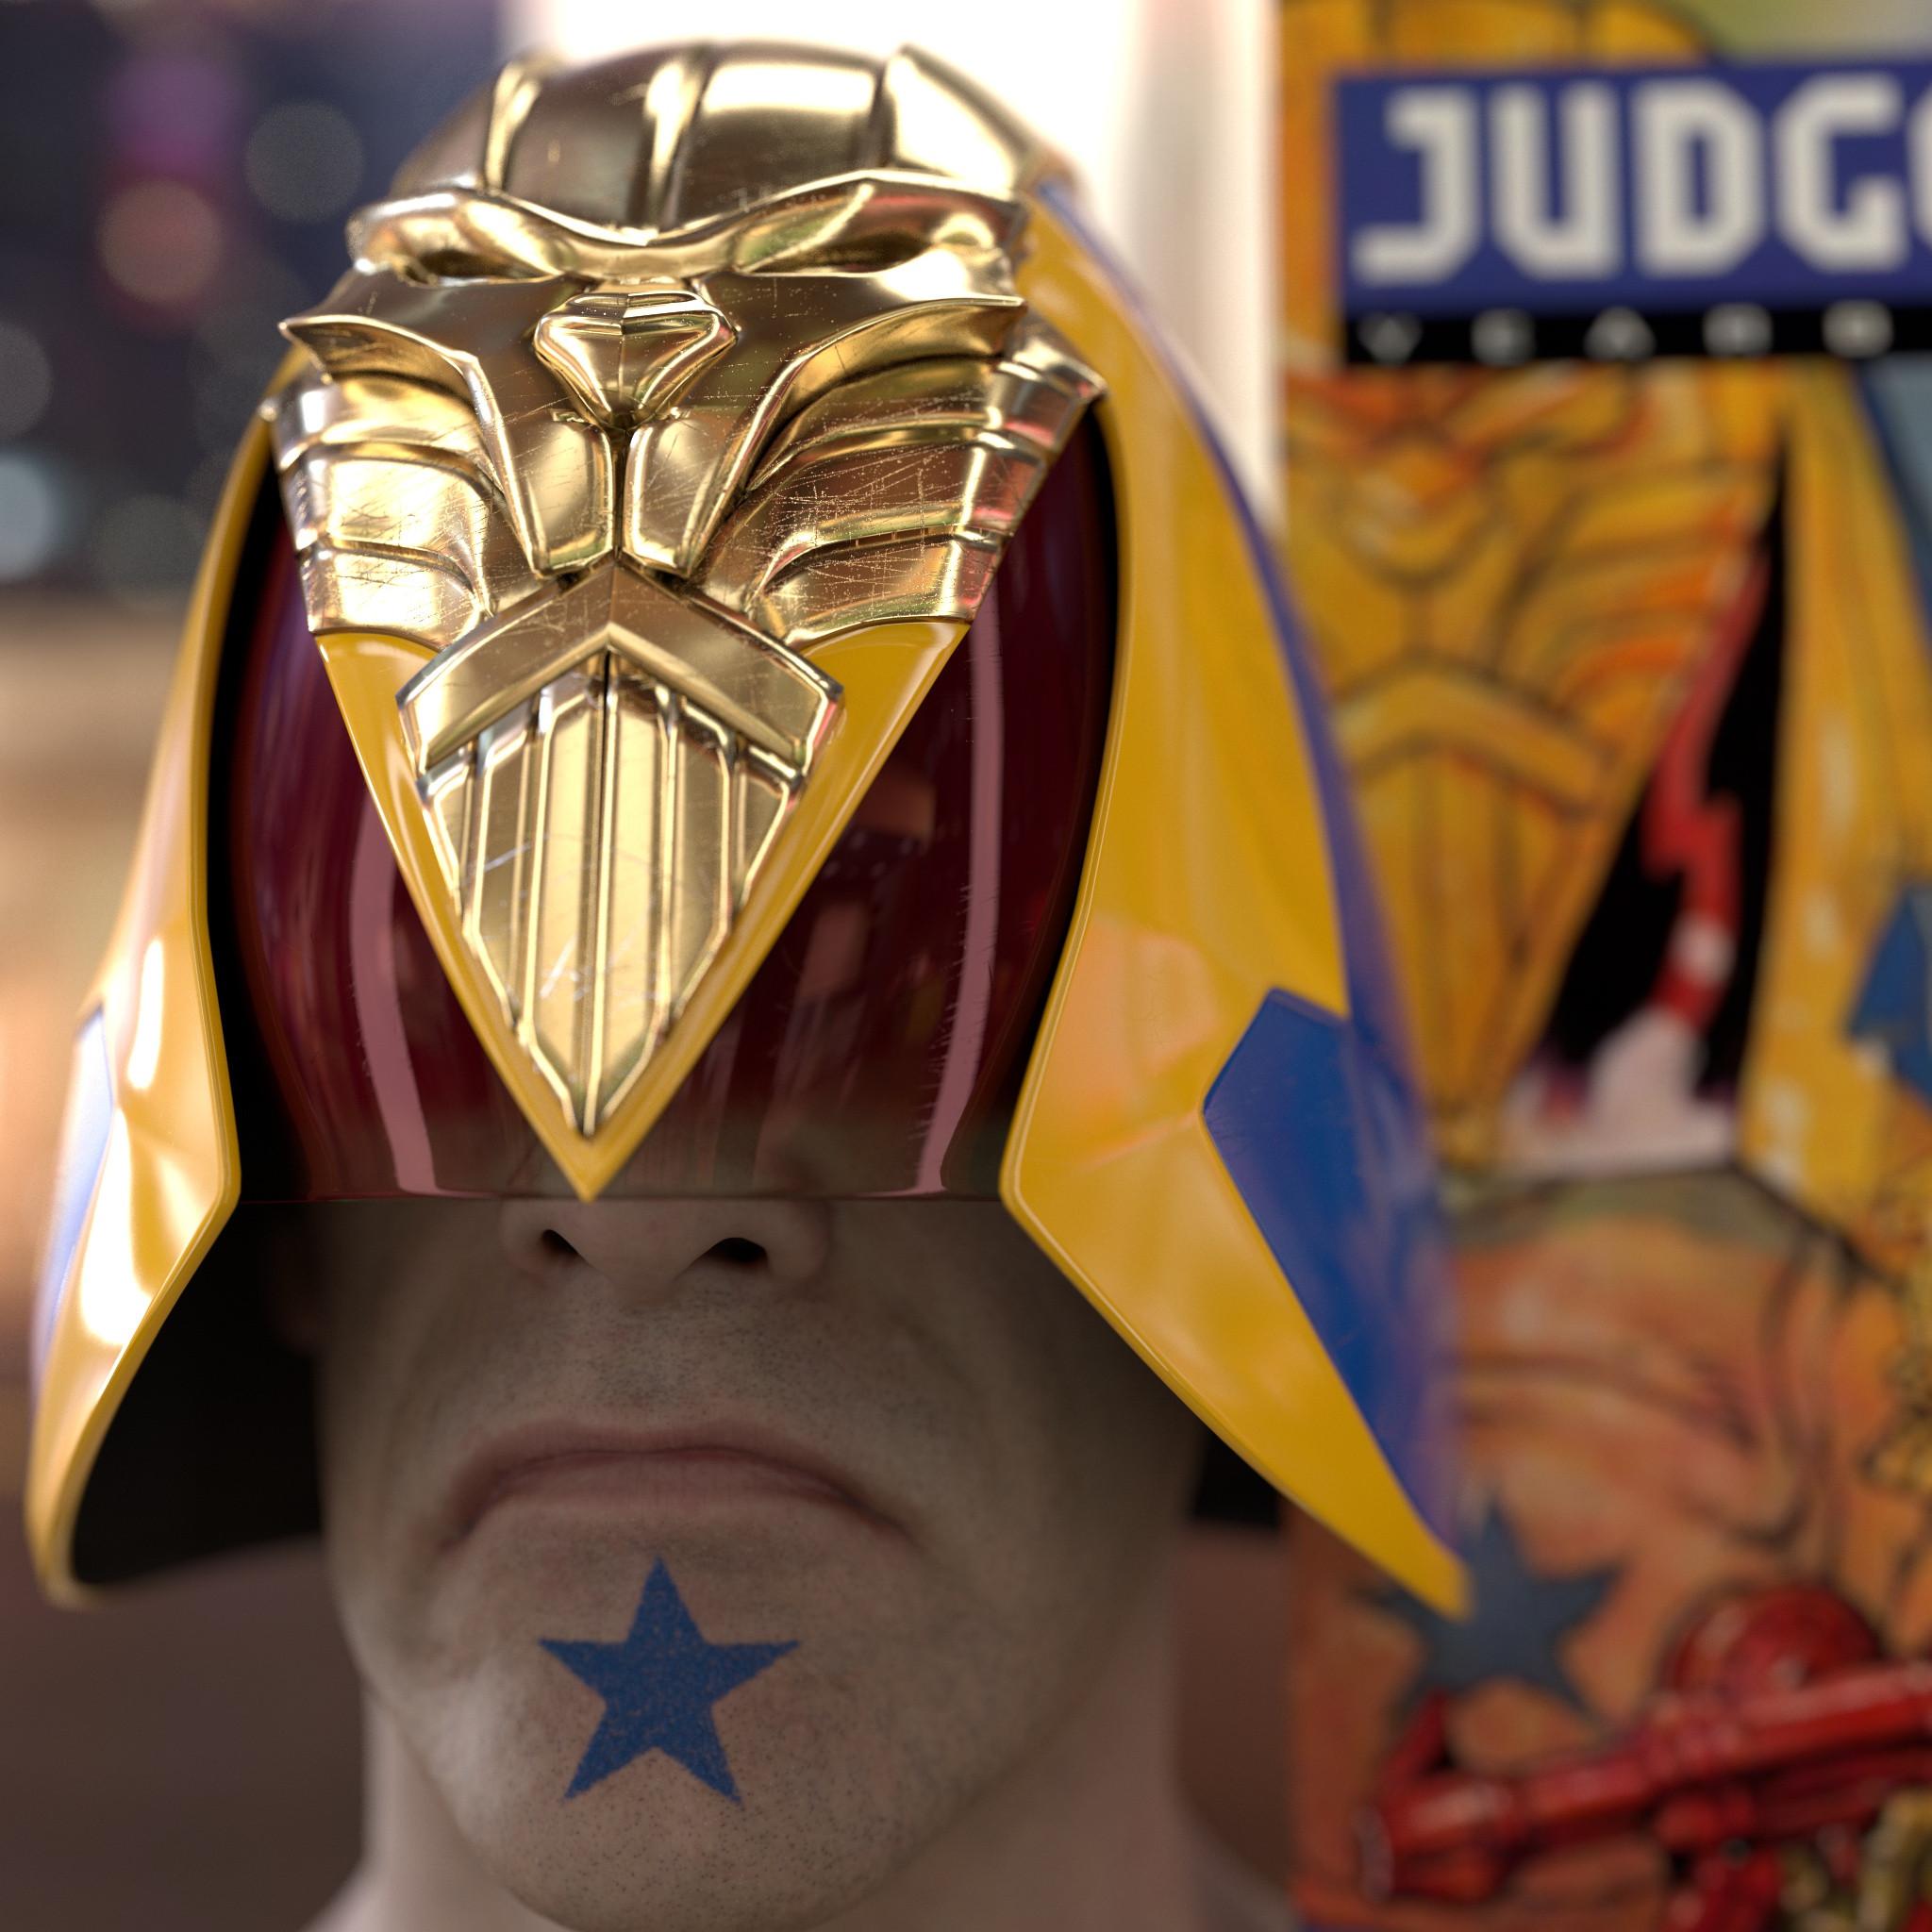 Brit-Cit Judge Helmet based on a design by Brendan McCarthy (Head sculpt by Ten24)